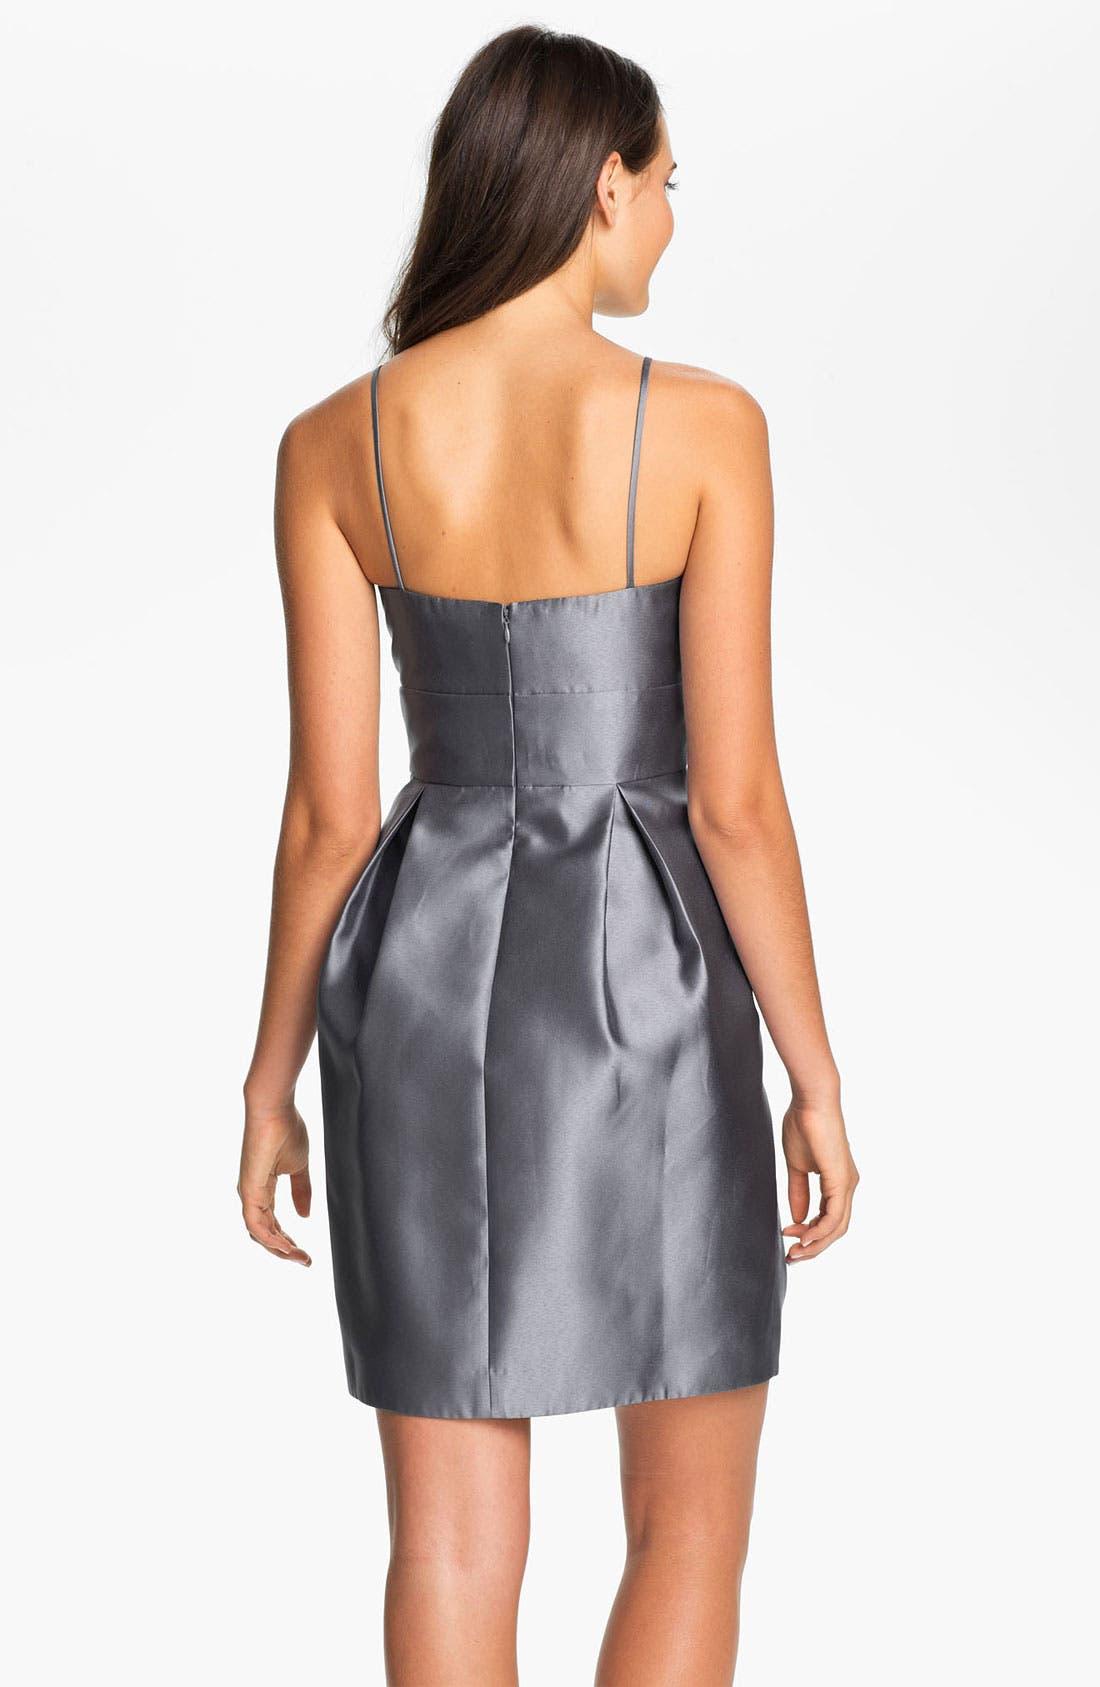 ELIZA J, Sweetheart Neckline Taffeta Tulip Dress, Alternate thumbnail 2, color, 040